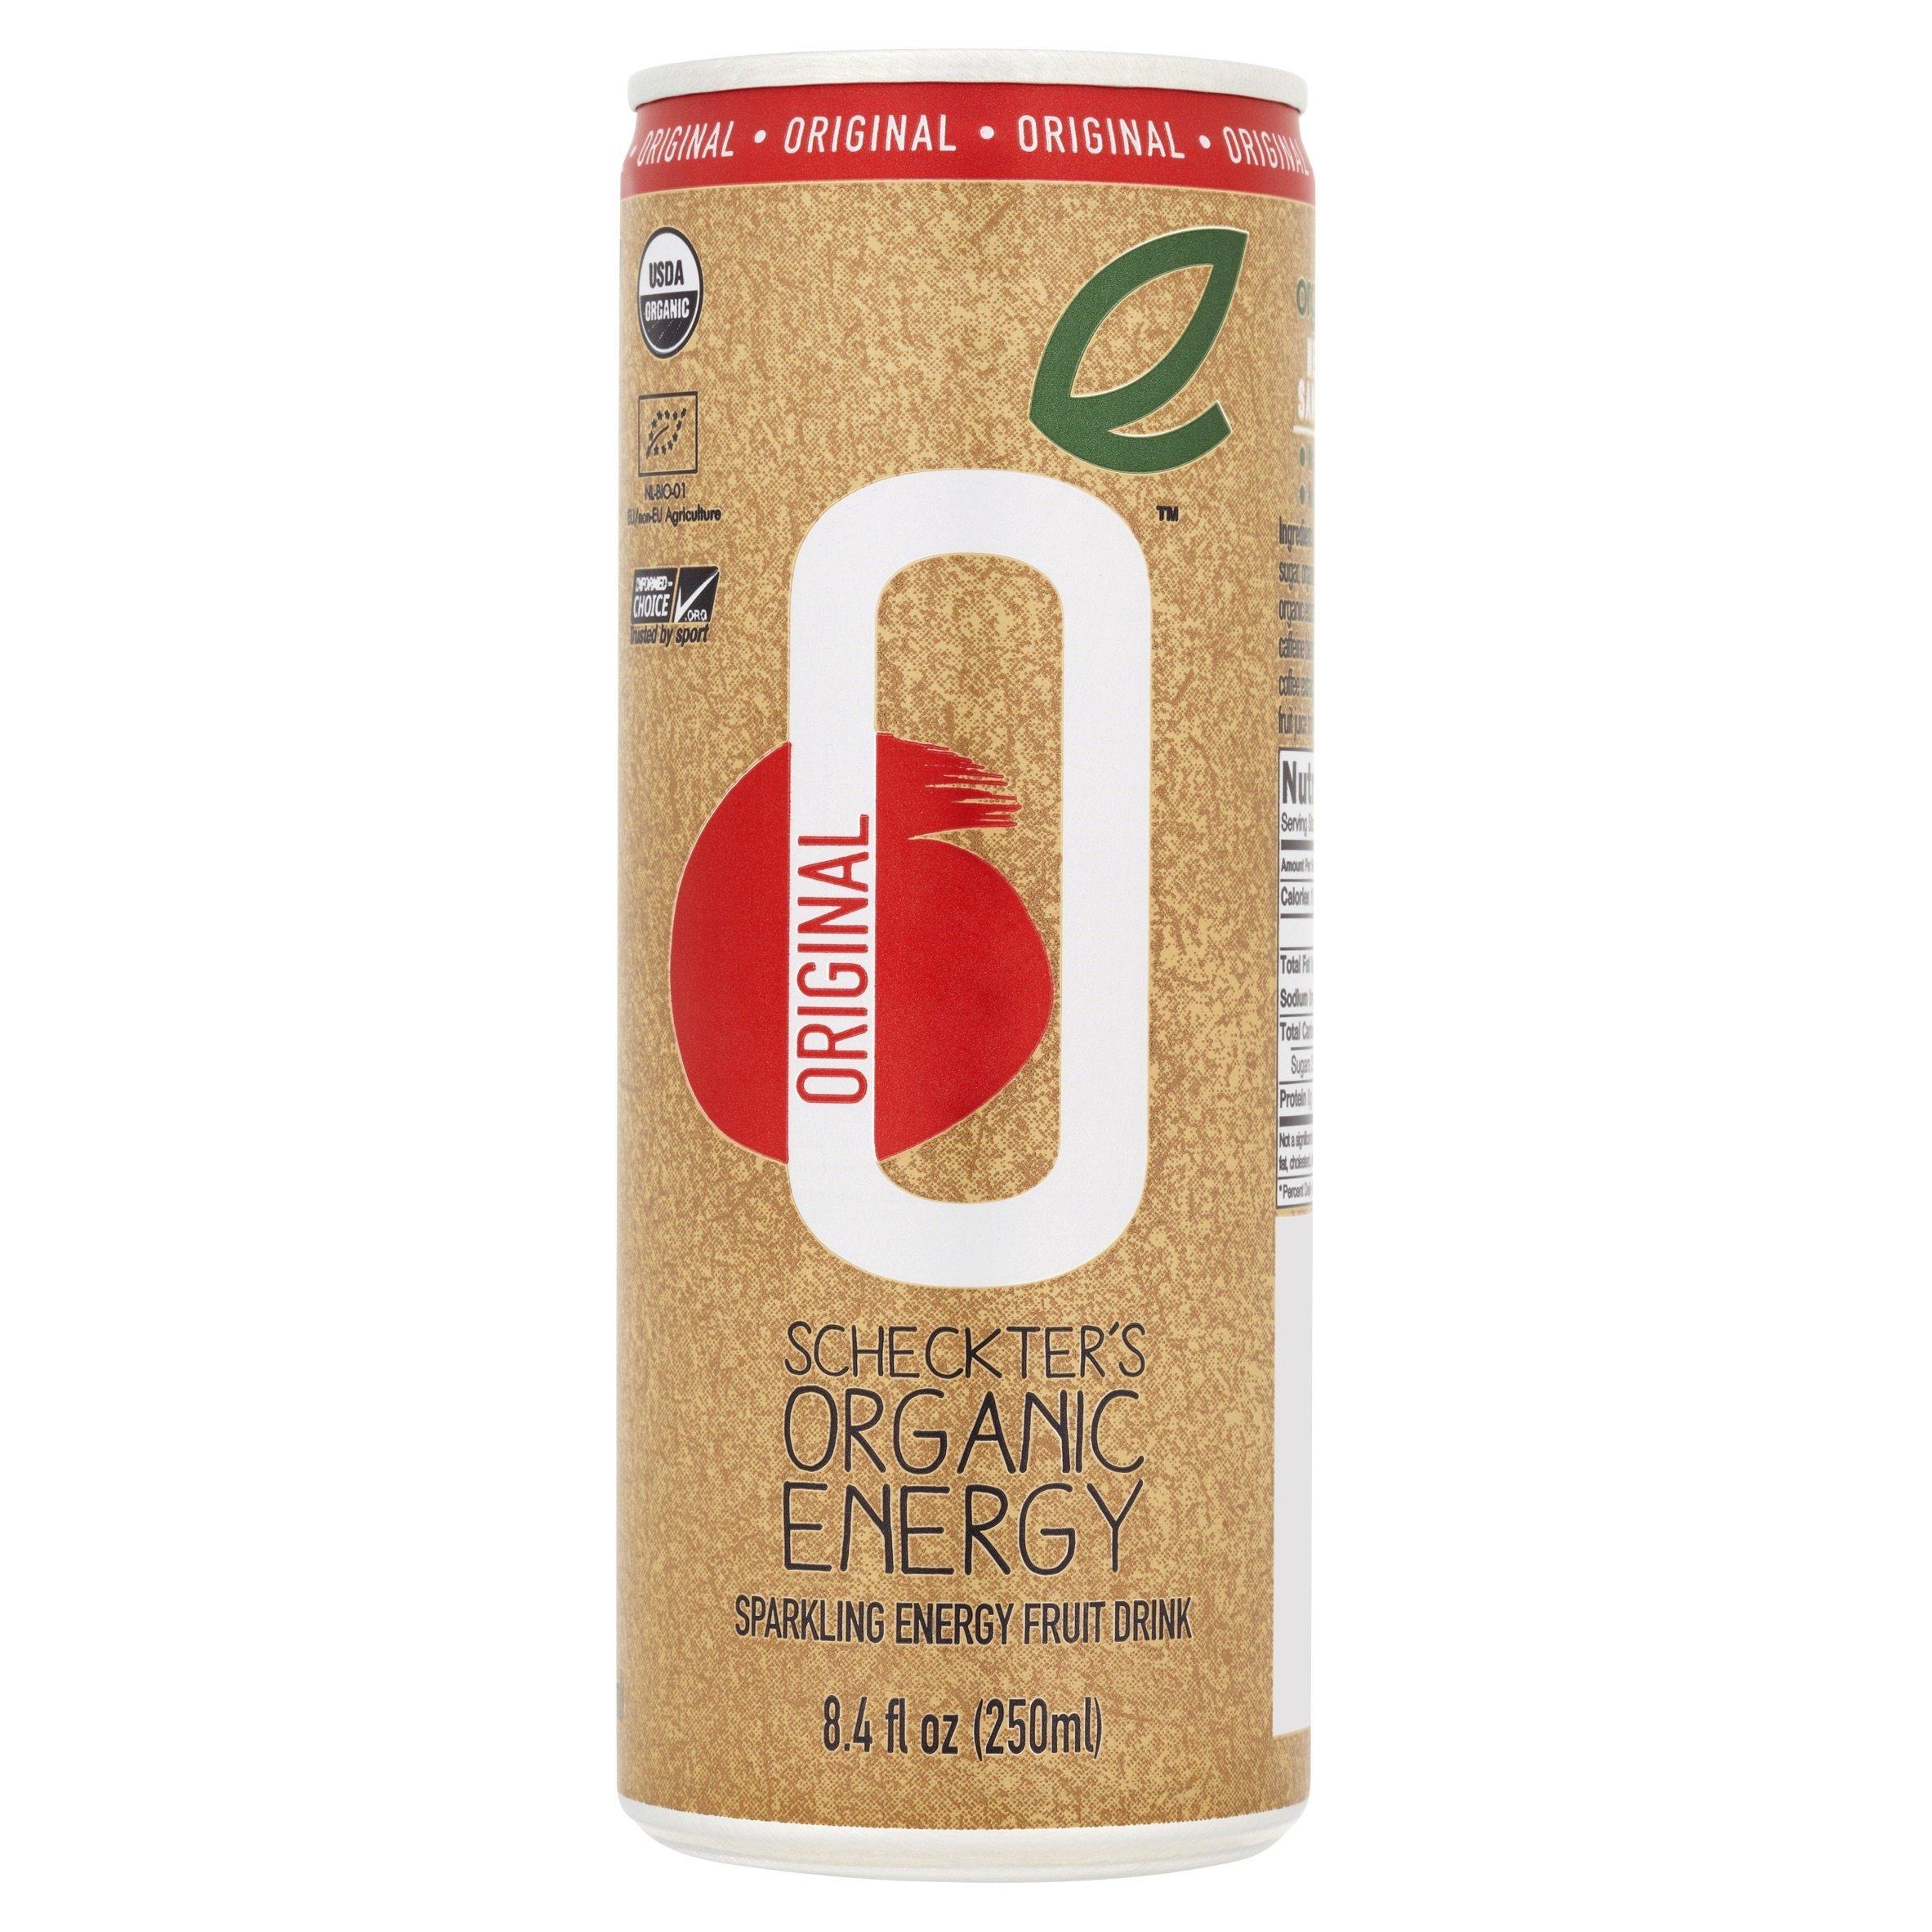 Scheckter's Organic Energy Drink, Original Pomegranate, 8.4 Ounce (Pack of 12)